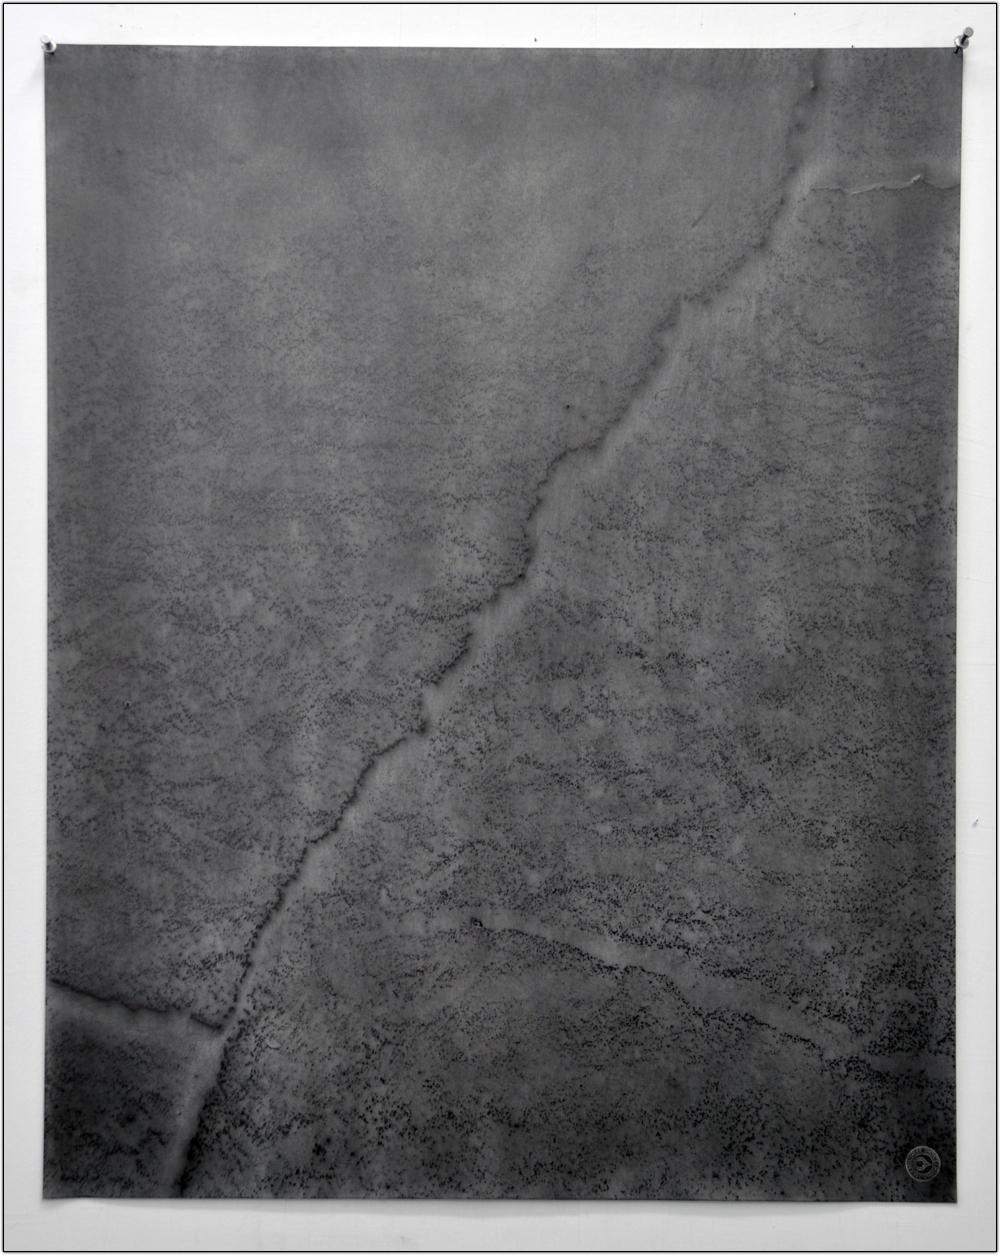 Fractured Foundations, Devlin VI 2012